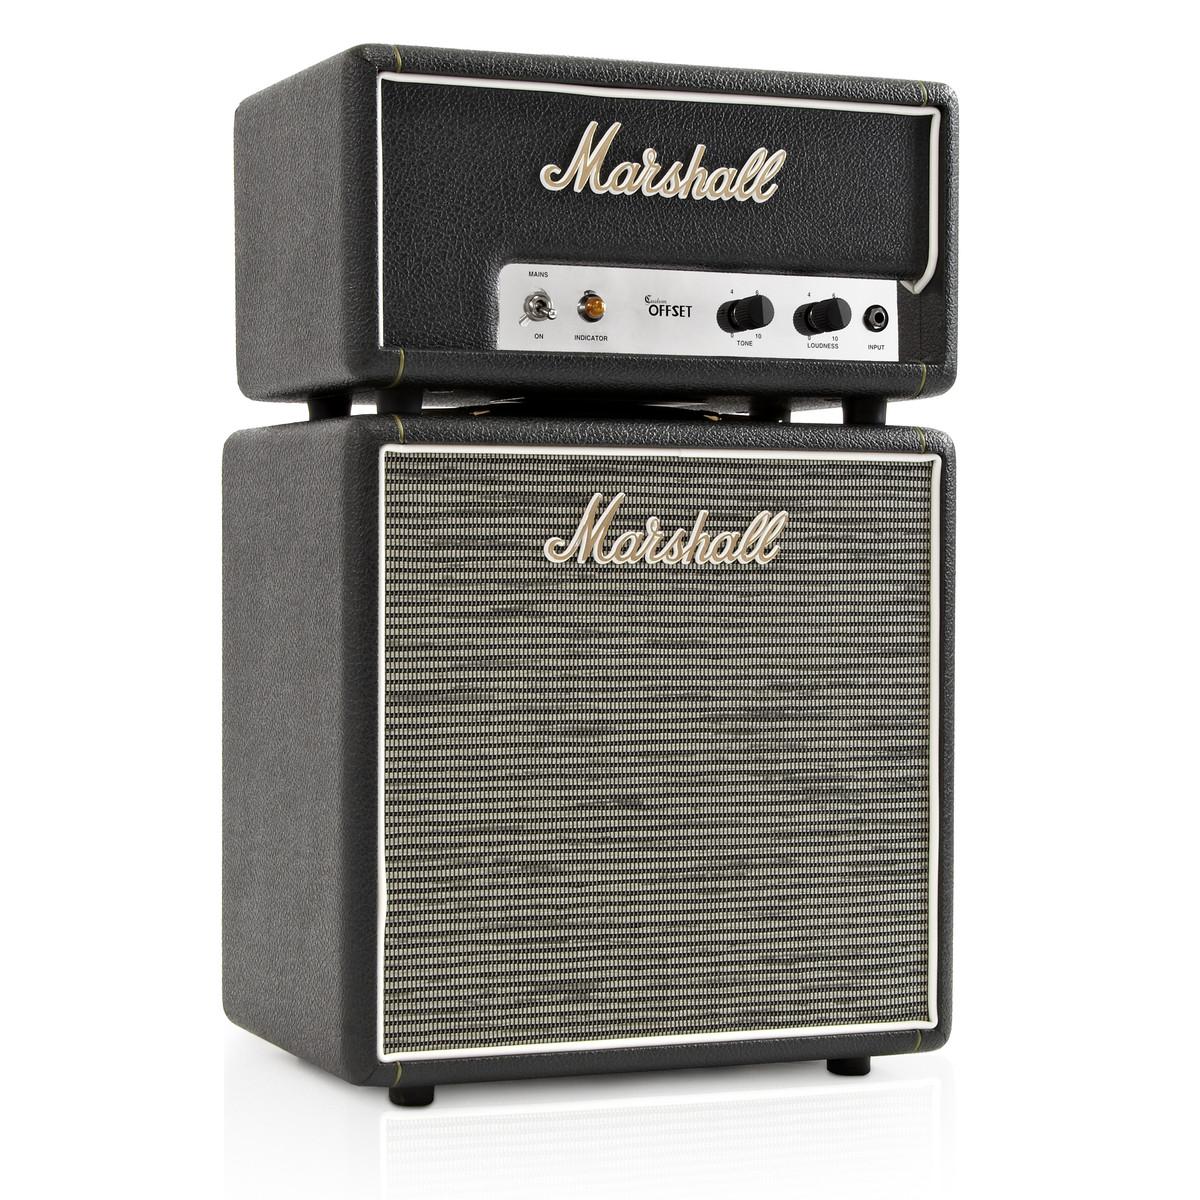 Marshall custom offset ii limited edition valve guitar amplifier